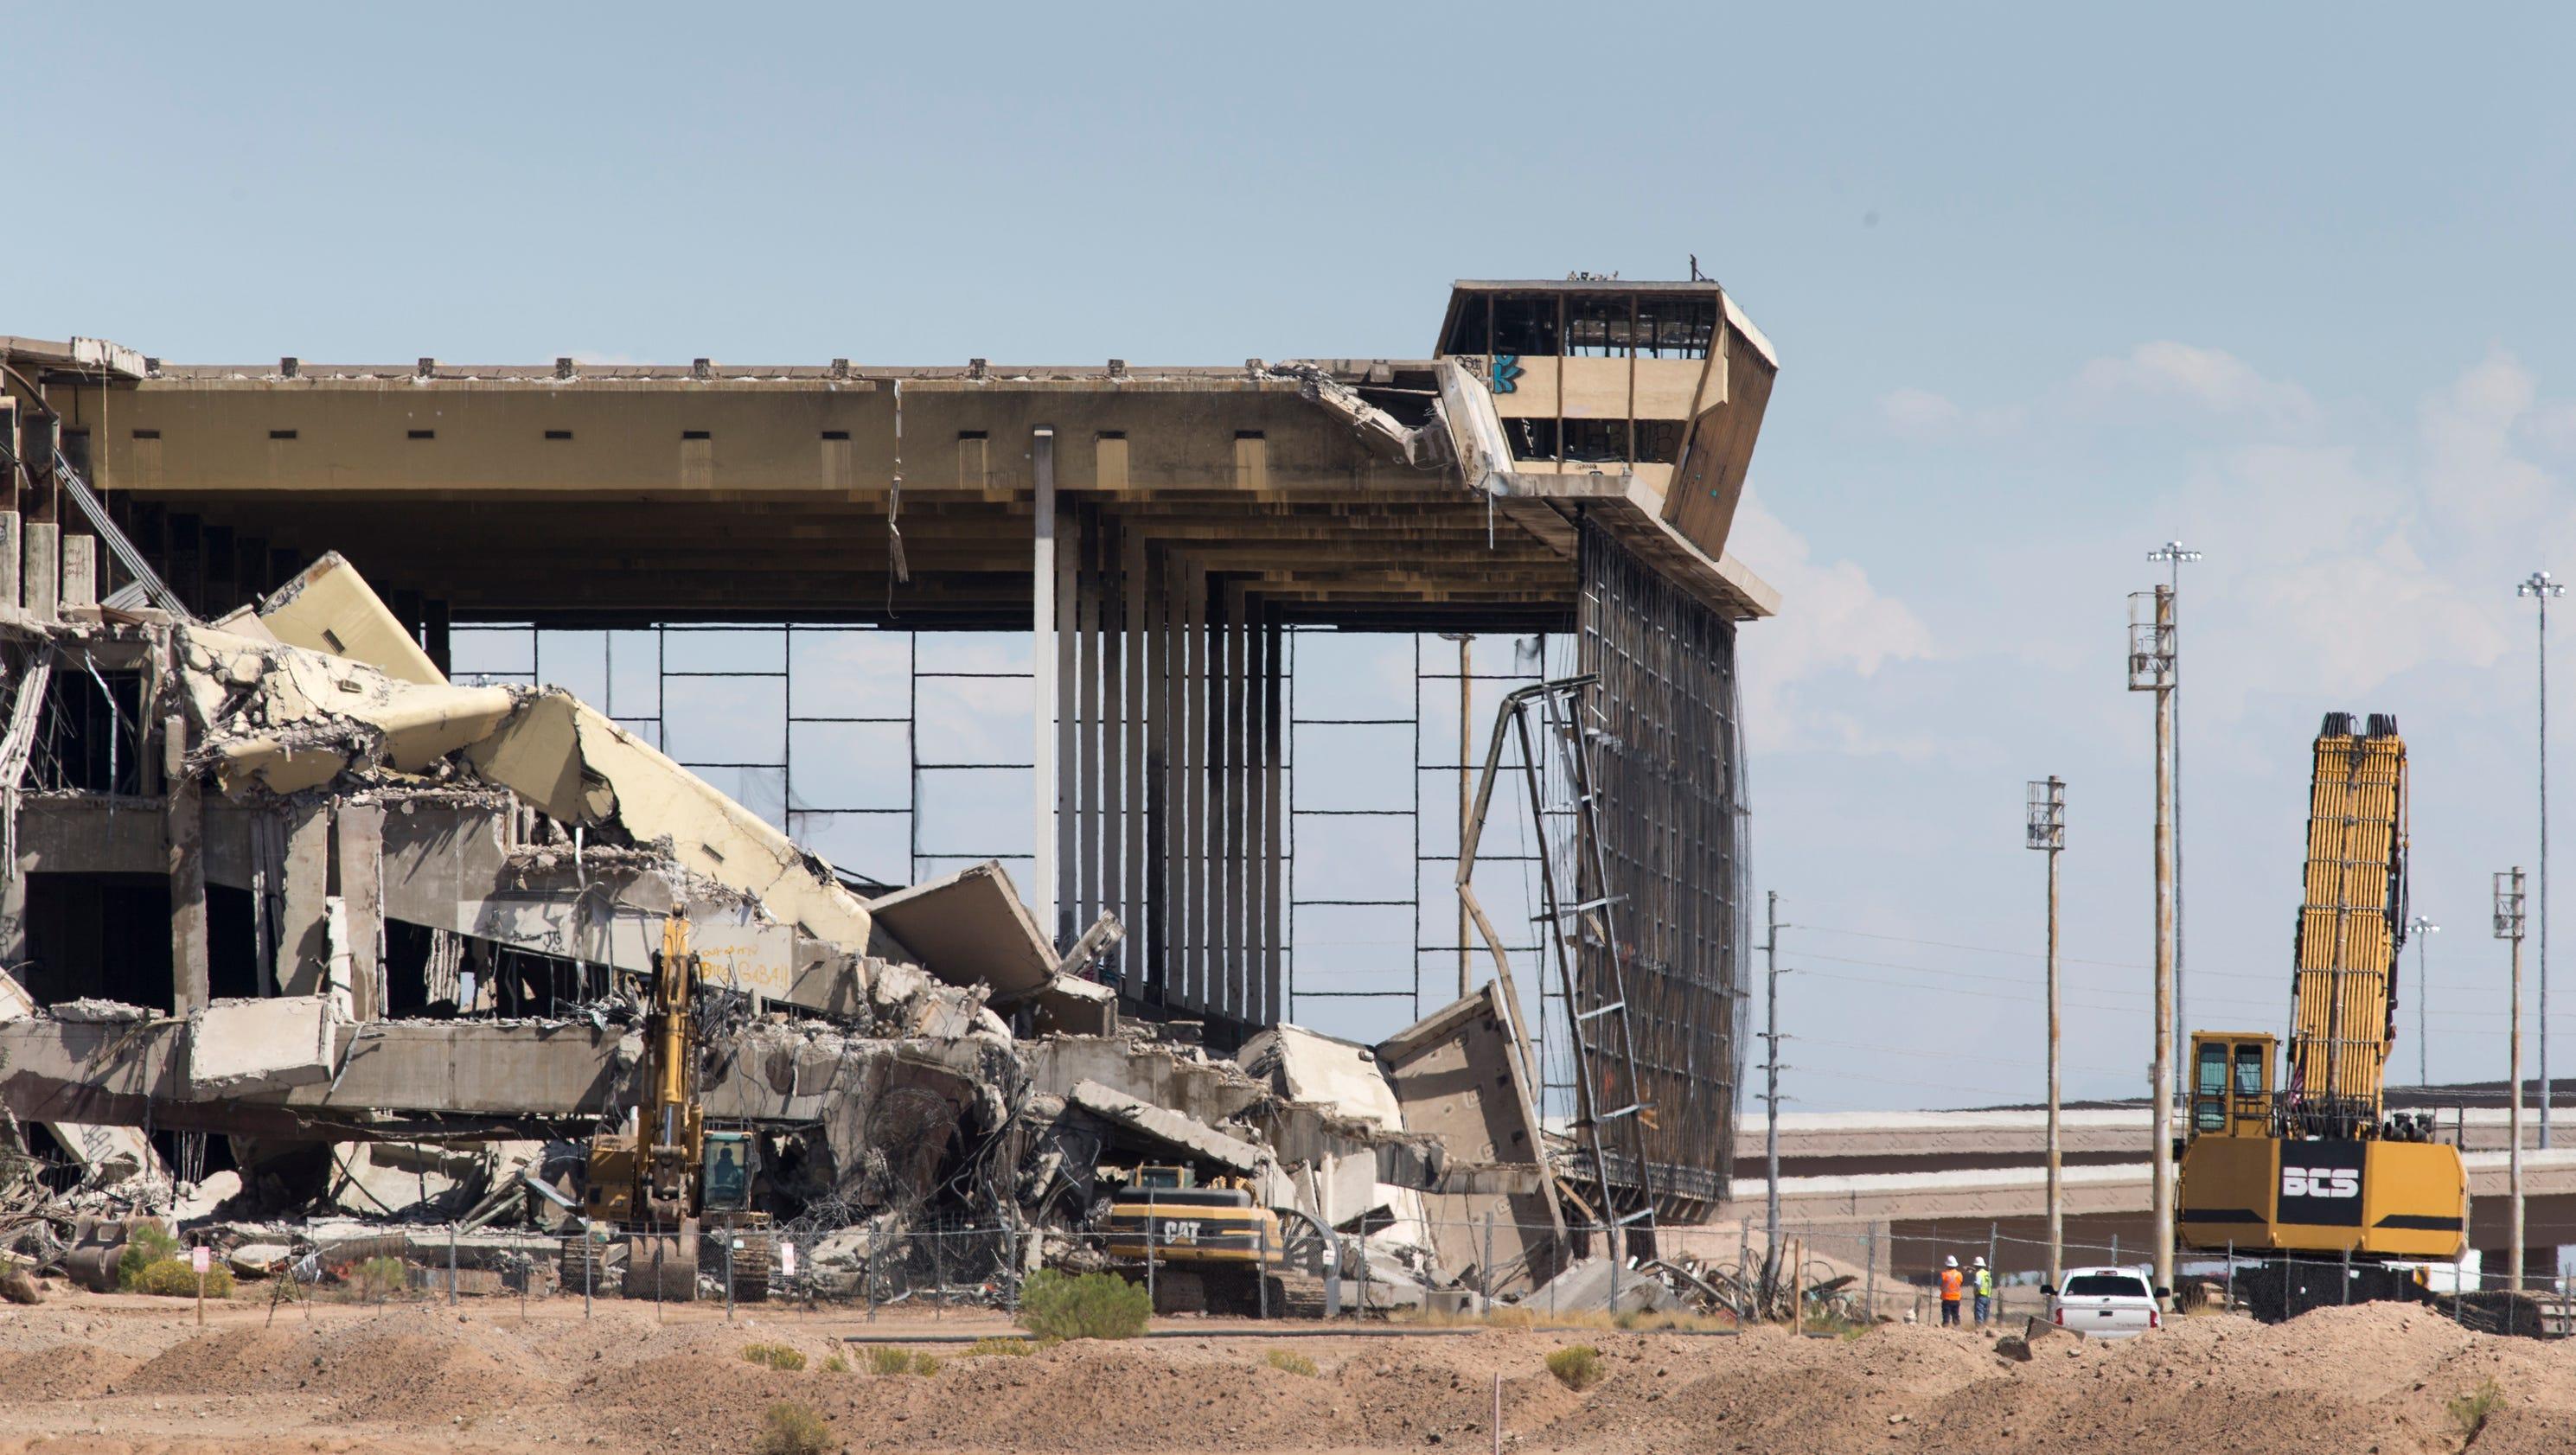 Demolition Of Iconic Phoenix Trotting Park Horse Racing